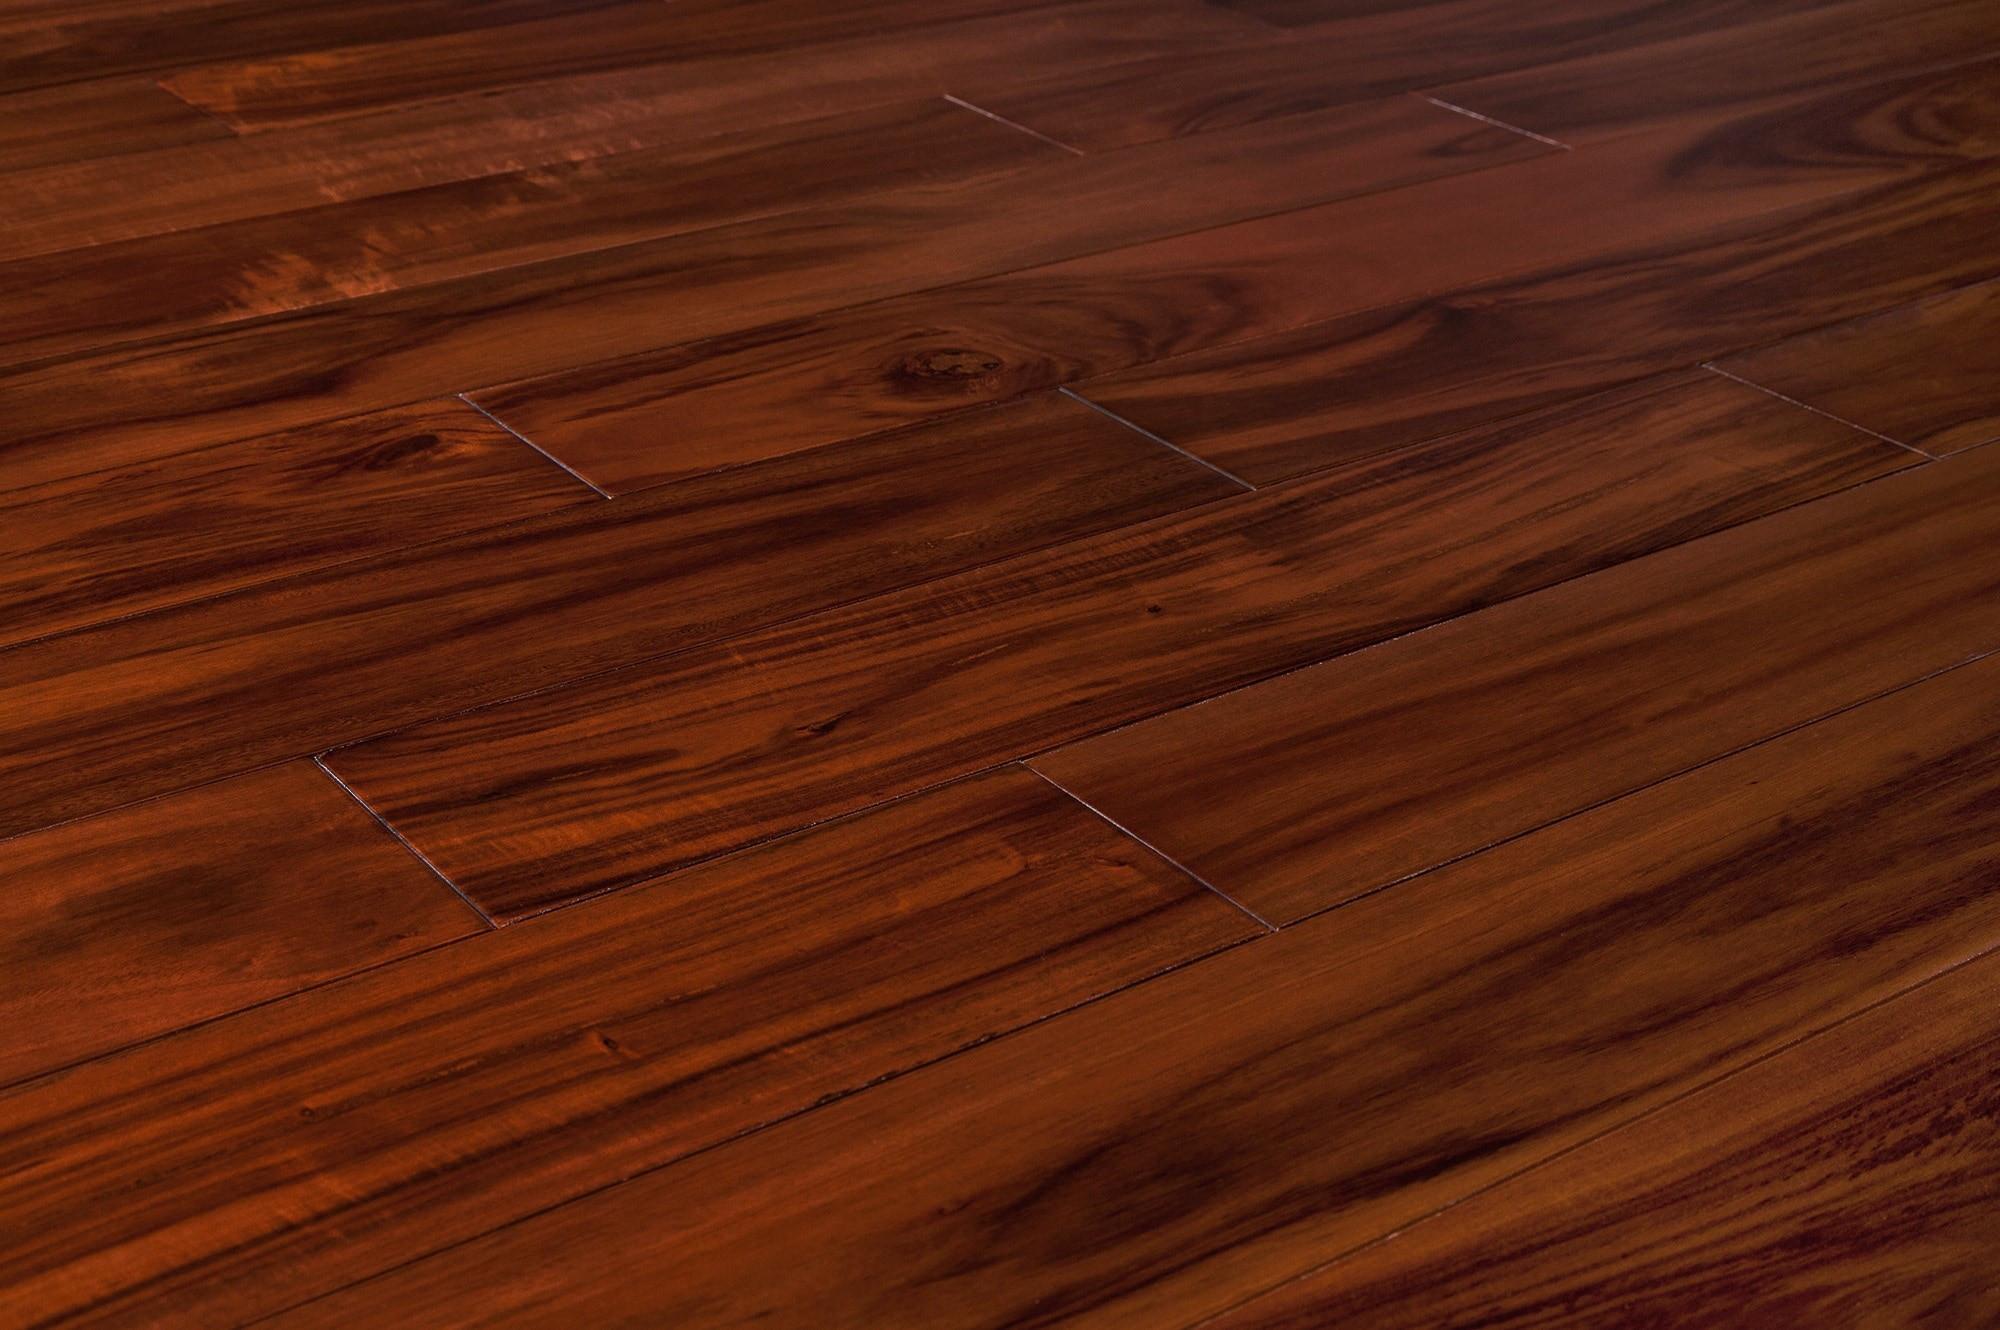 hand scraped hardwood flooring wide plank of 14 unique acacia solid hardwood flooring pics dizpos com pertaining to acacia solid hardwood flooring new clearance wood flooring house unique wide plank solid hardwood with photograph